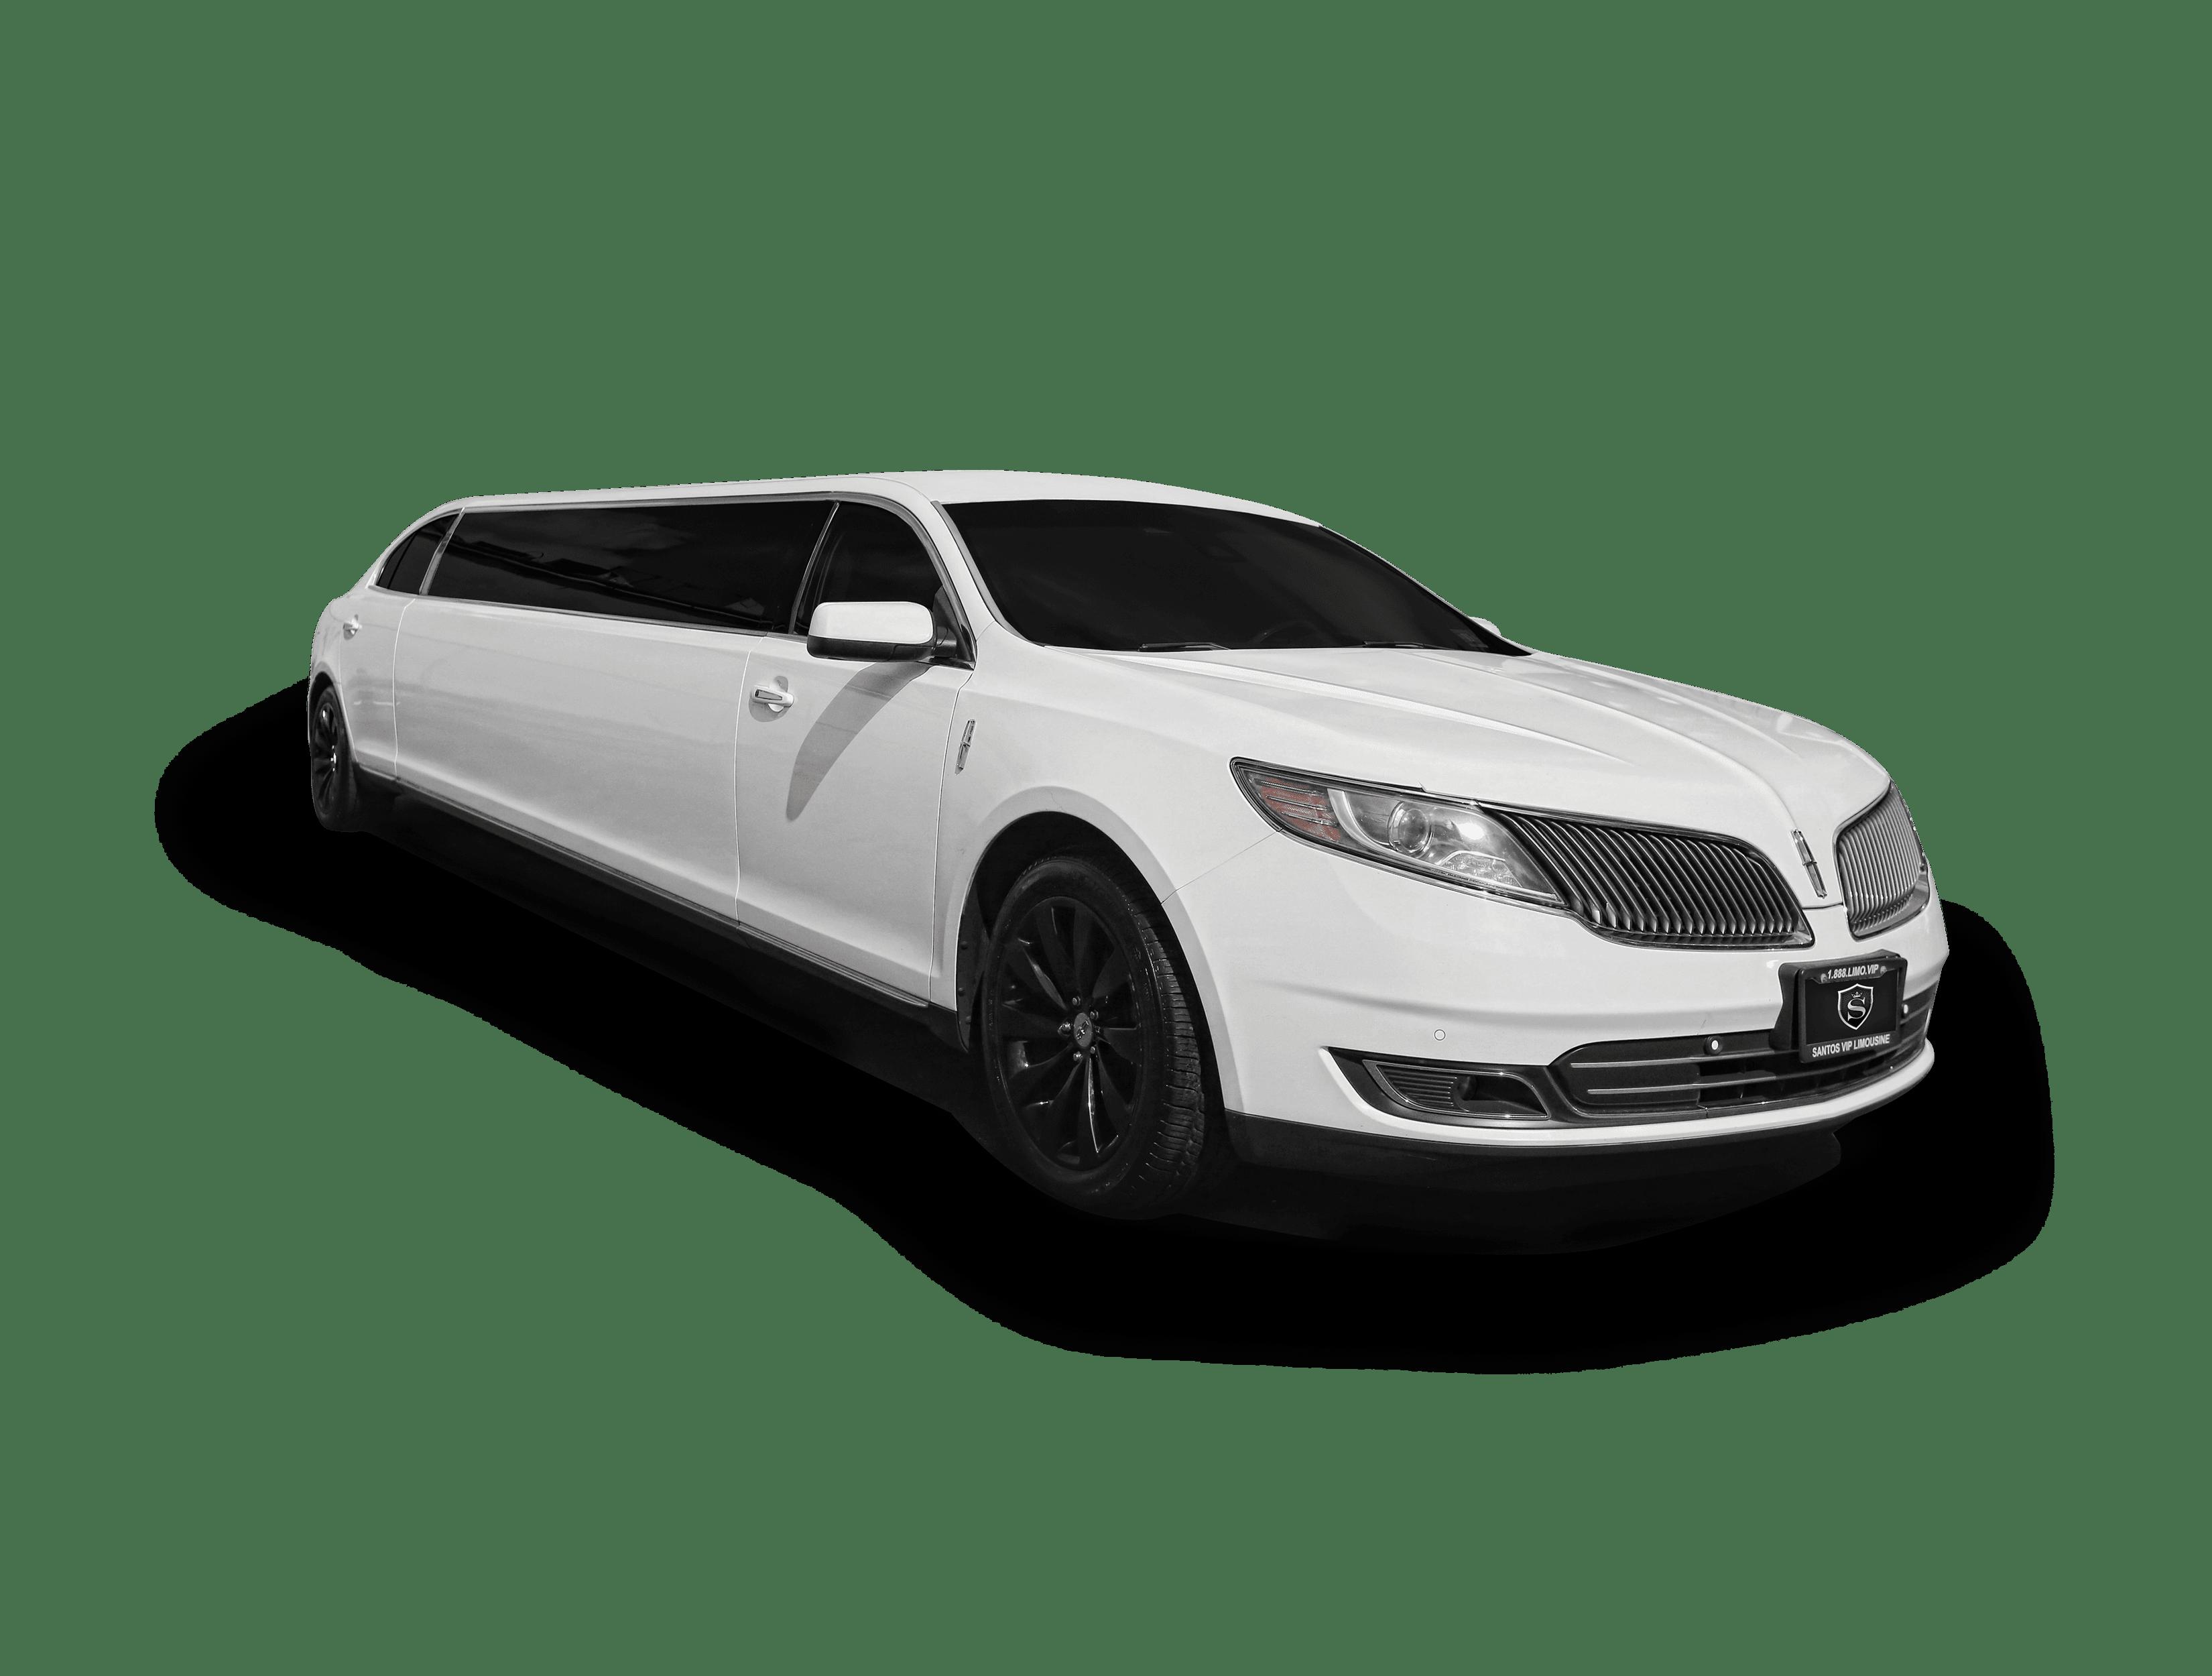 Lincoln MKS stretch limousine